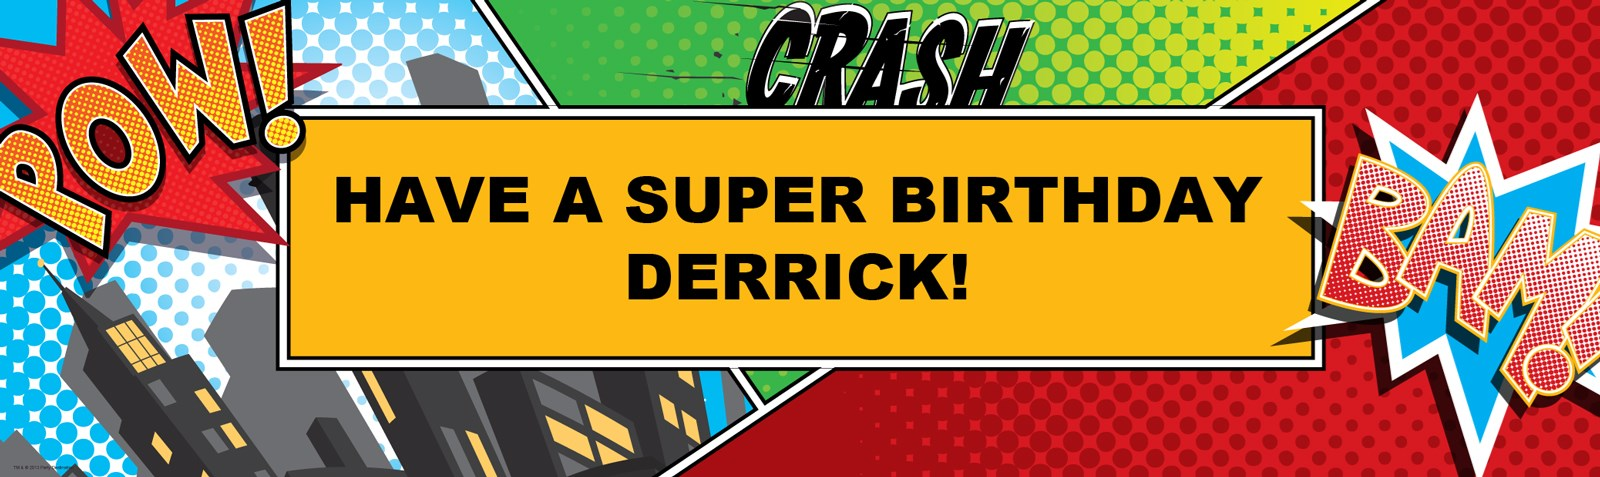 superhero comics personalized vinyl banner  birthdayexpress